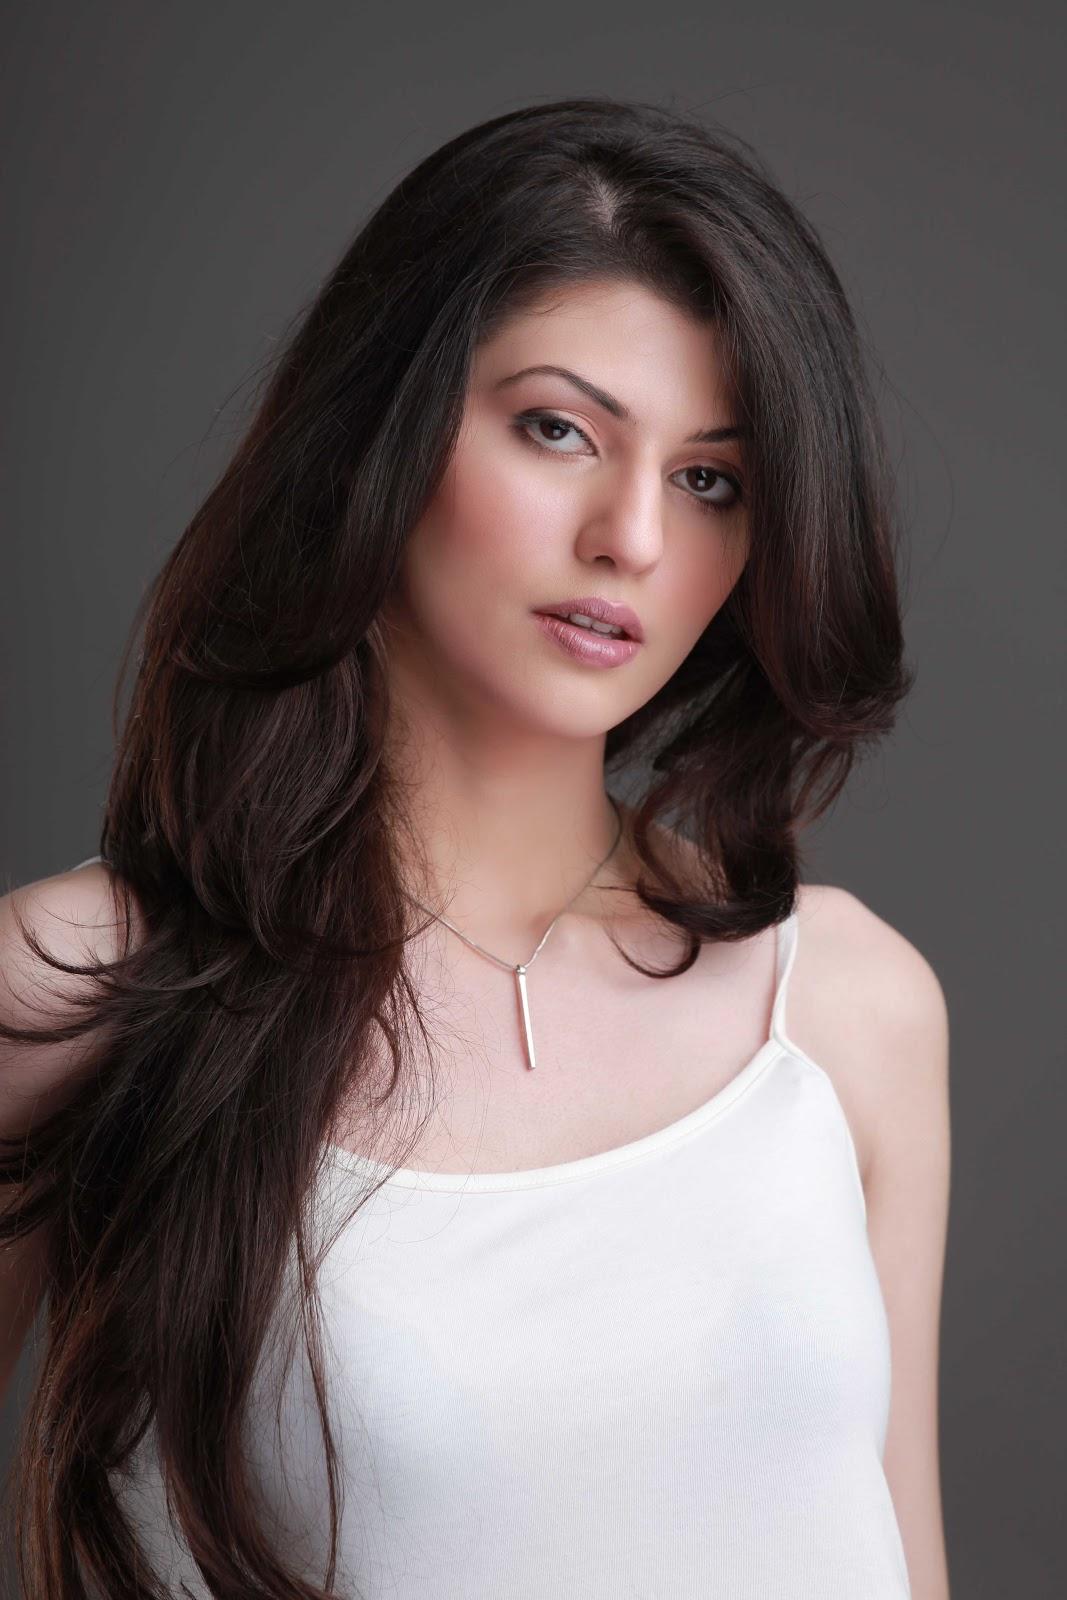 Veet Miss Super Model Hd images - Raag.fm Bollywood News